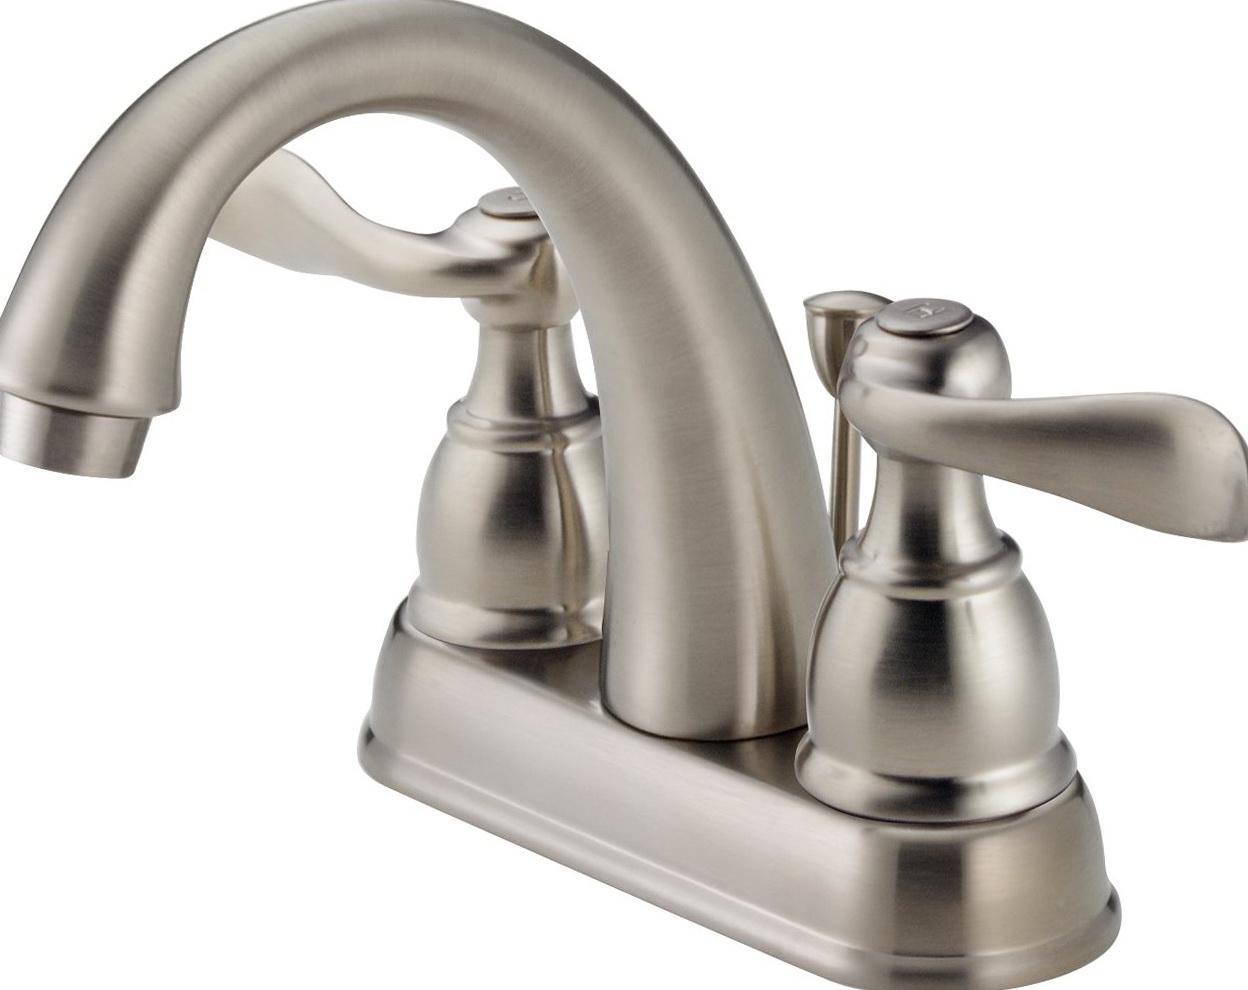 Delta Bathroom Faucets Brushed Nickel